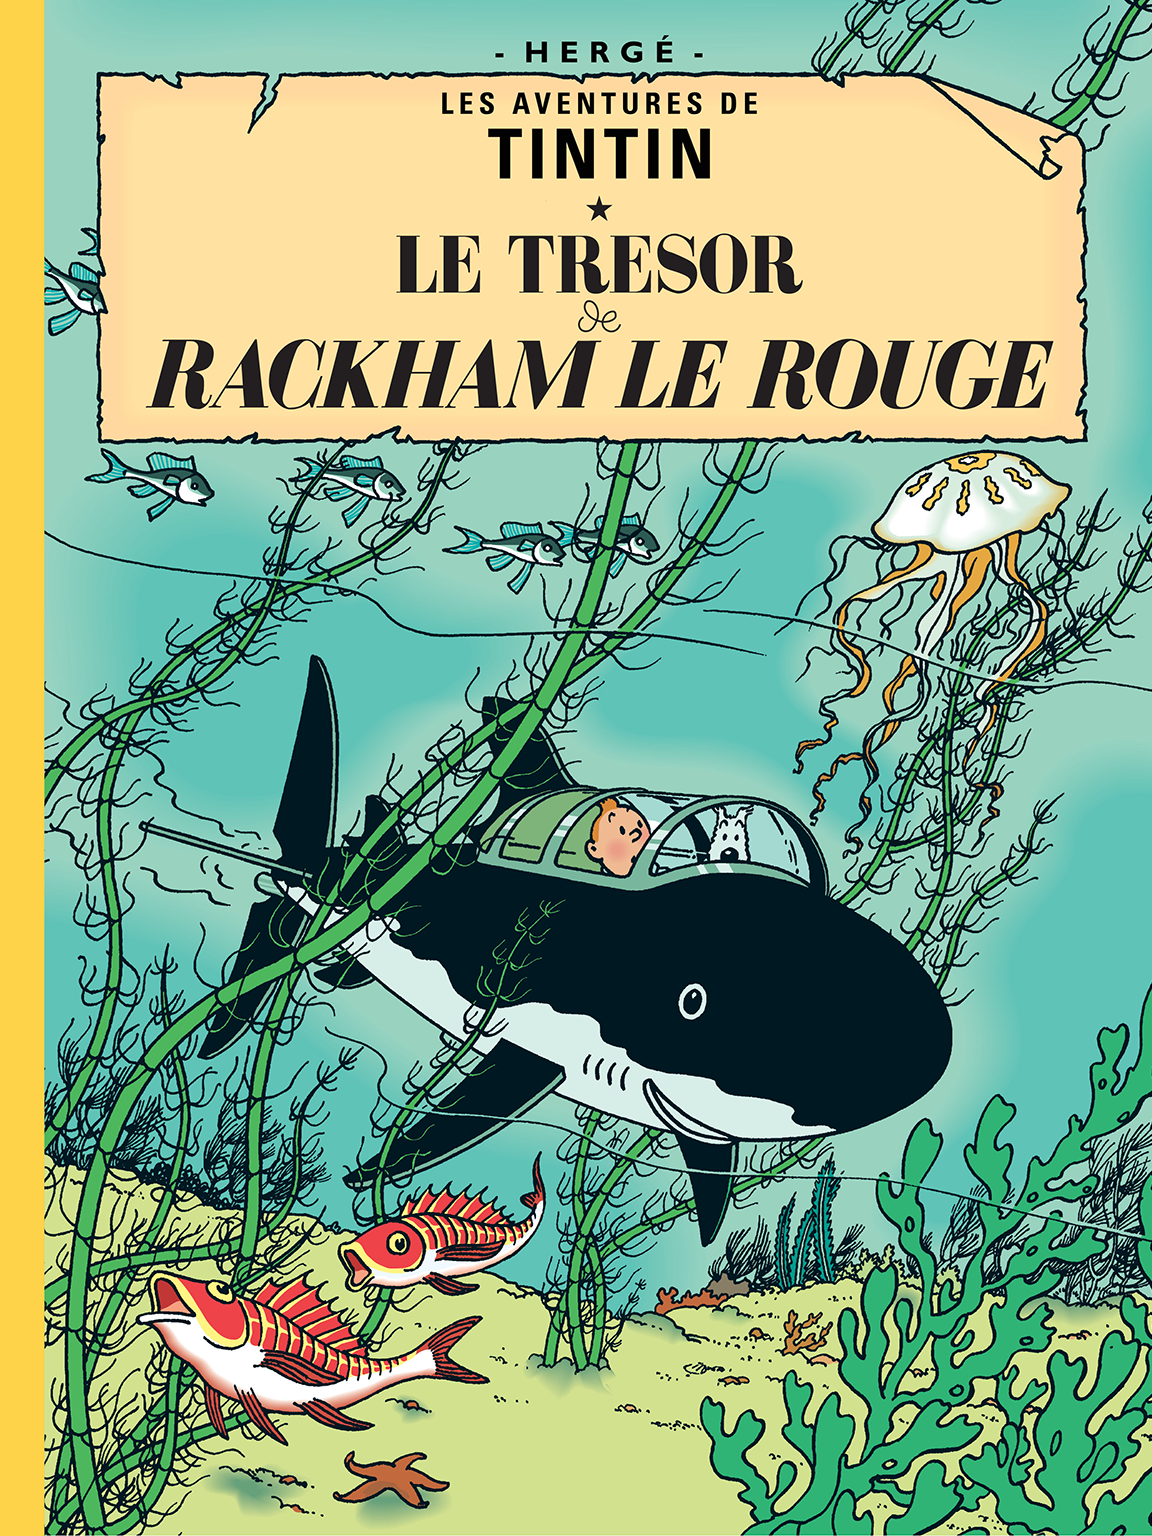 TINTIN Red Rackham's Treasure Hergé RG tintin.com